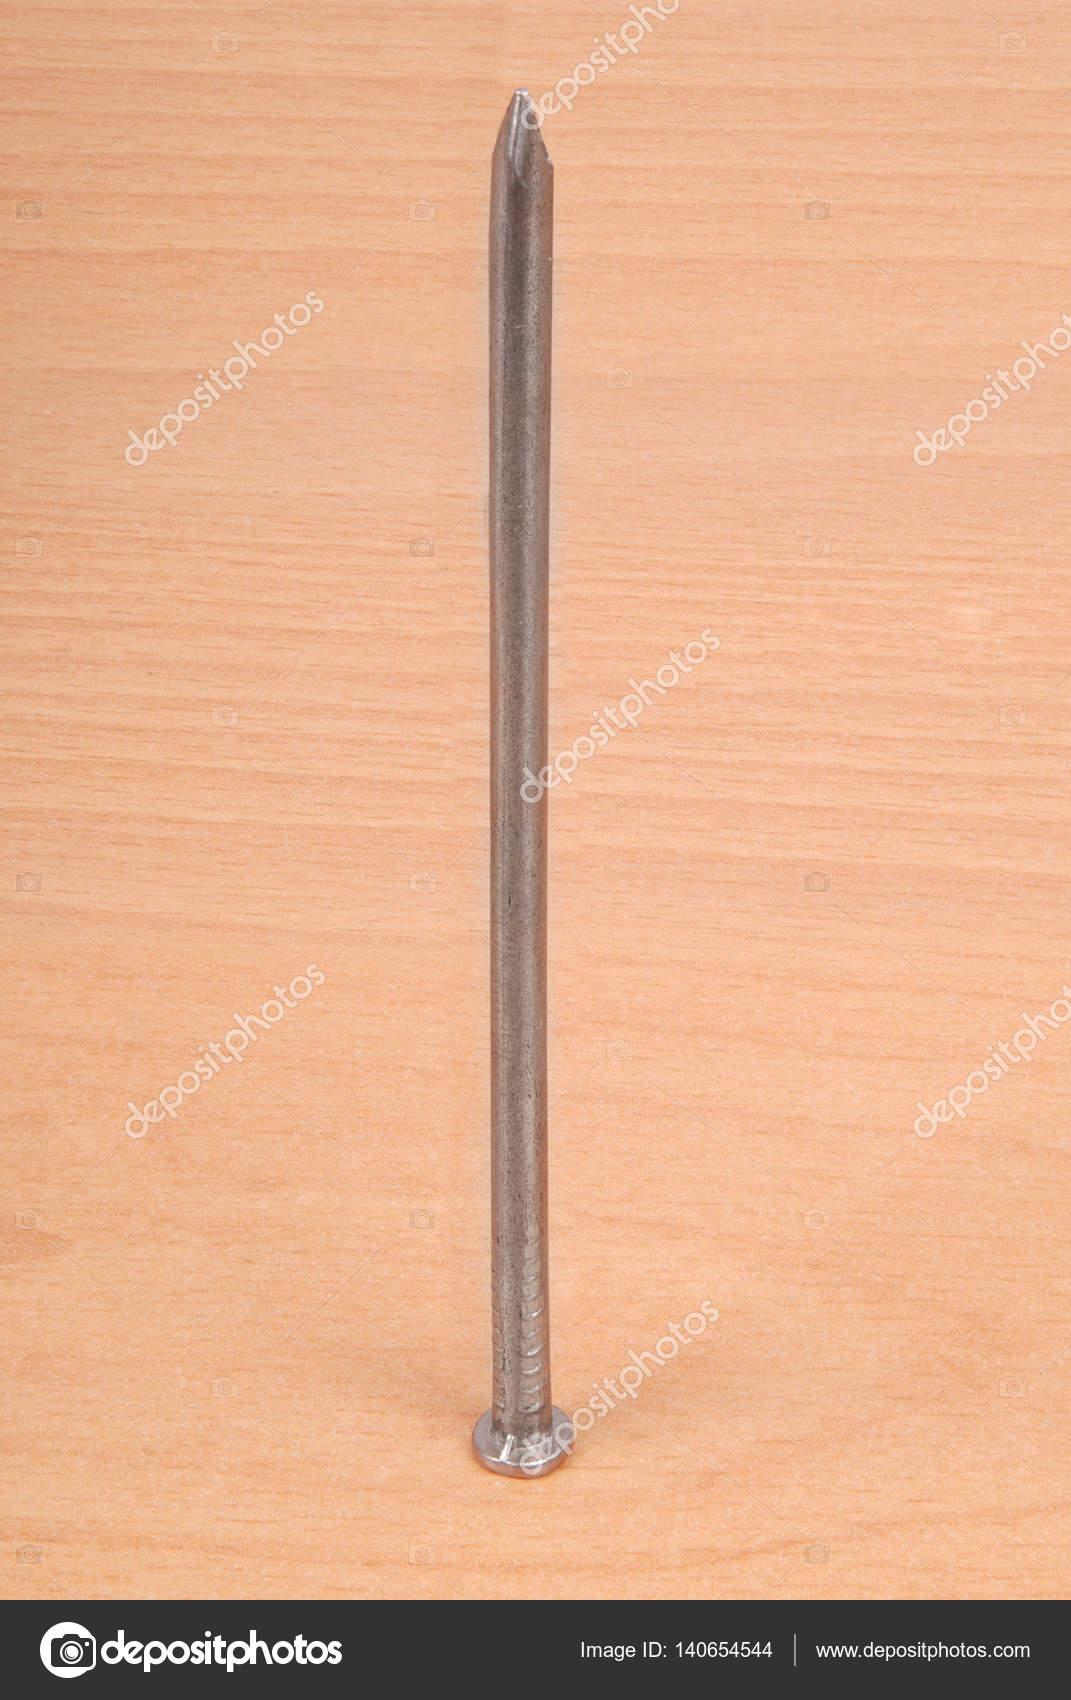 Großer Metall Nagel — Stockfoto © akova777 #140654544